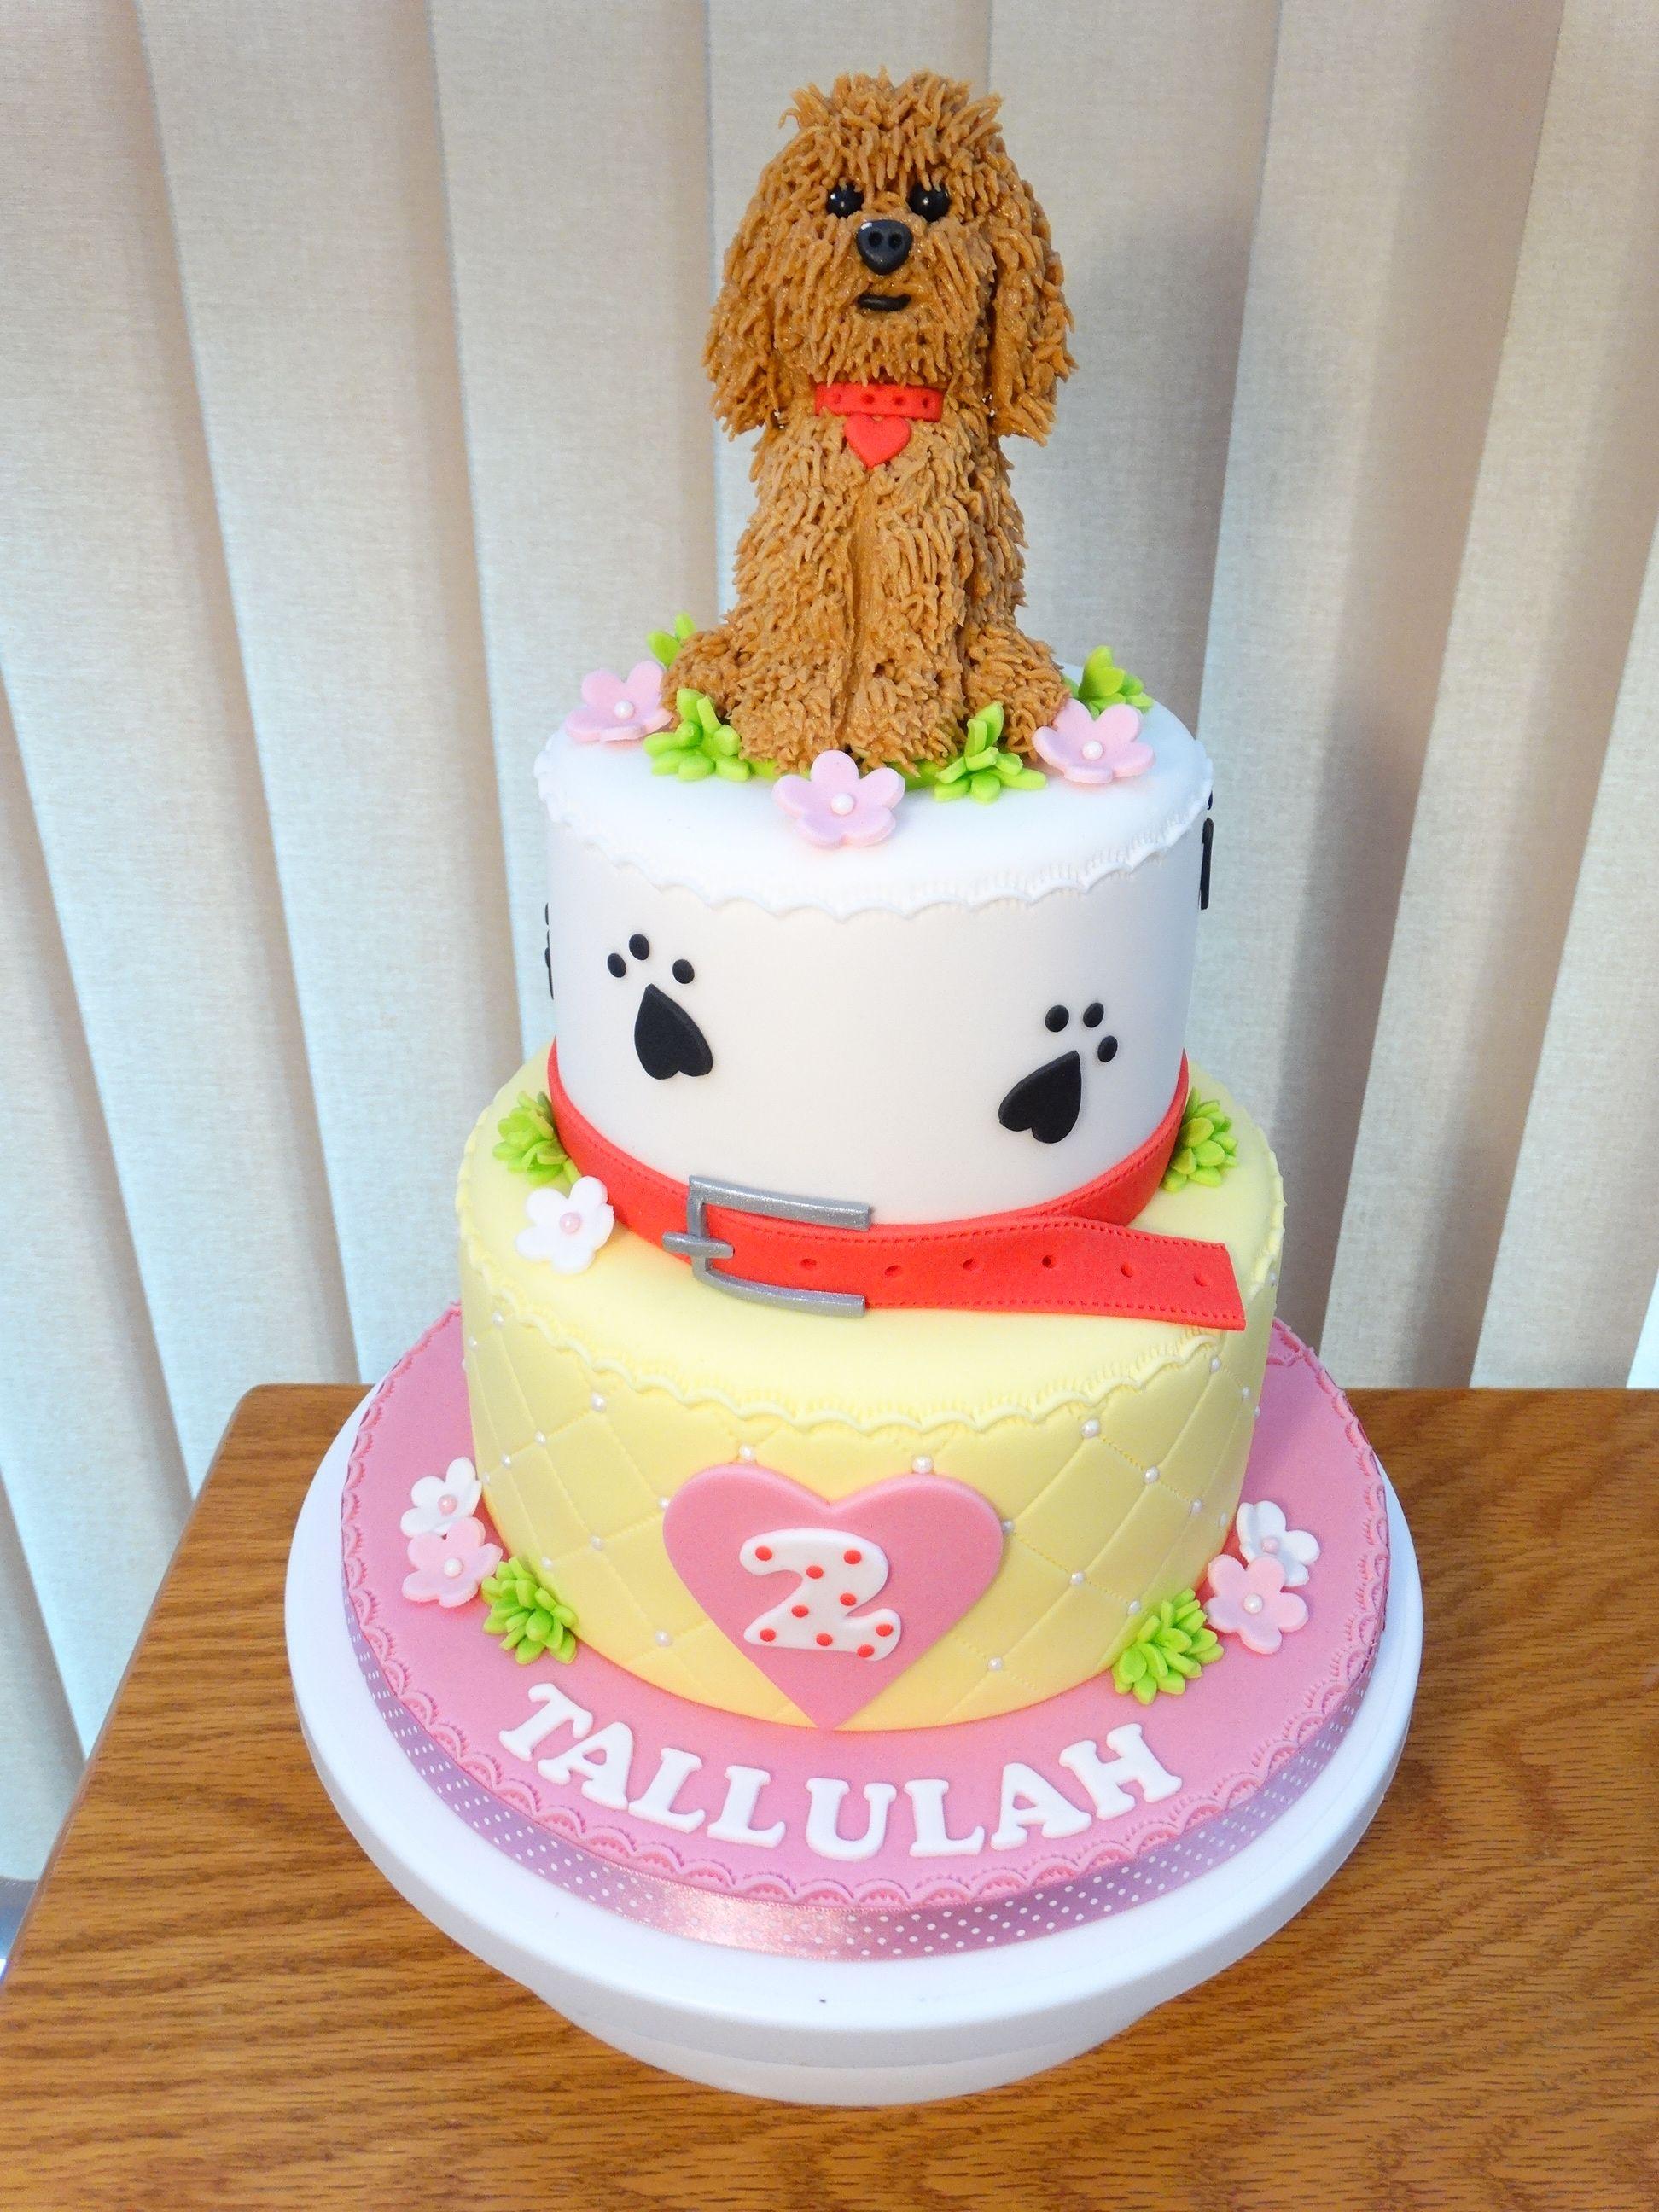 Fine Waffle Wonder Dog Cake Xmcx Dog Cakes Kids Cake Toppers Dog Funny Birthday Cards Online Sheoxdamsfinfo